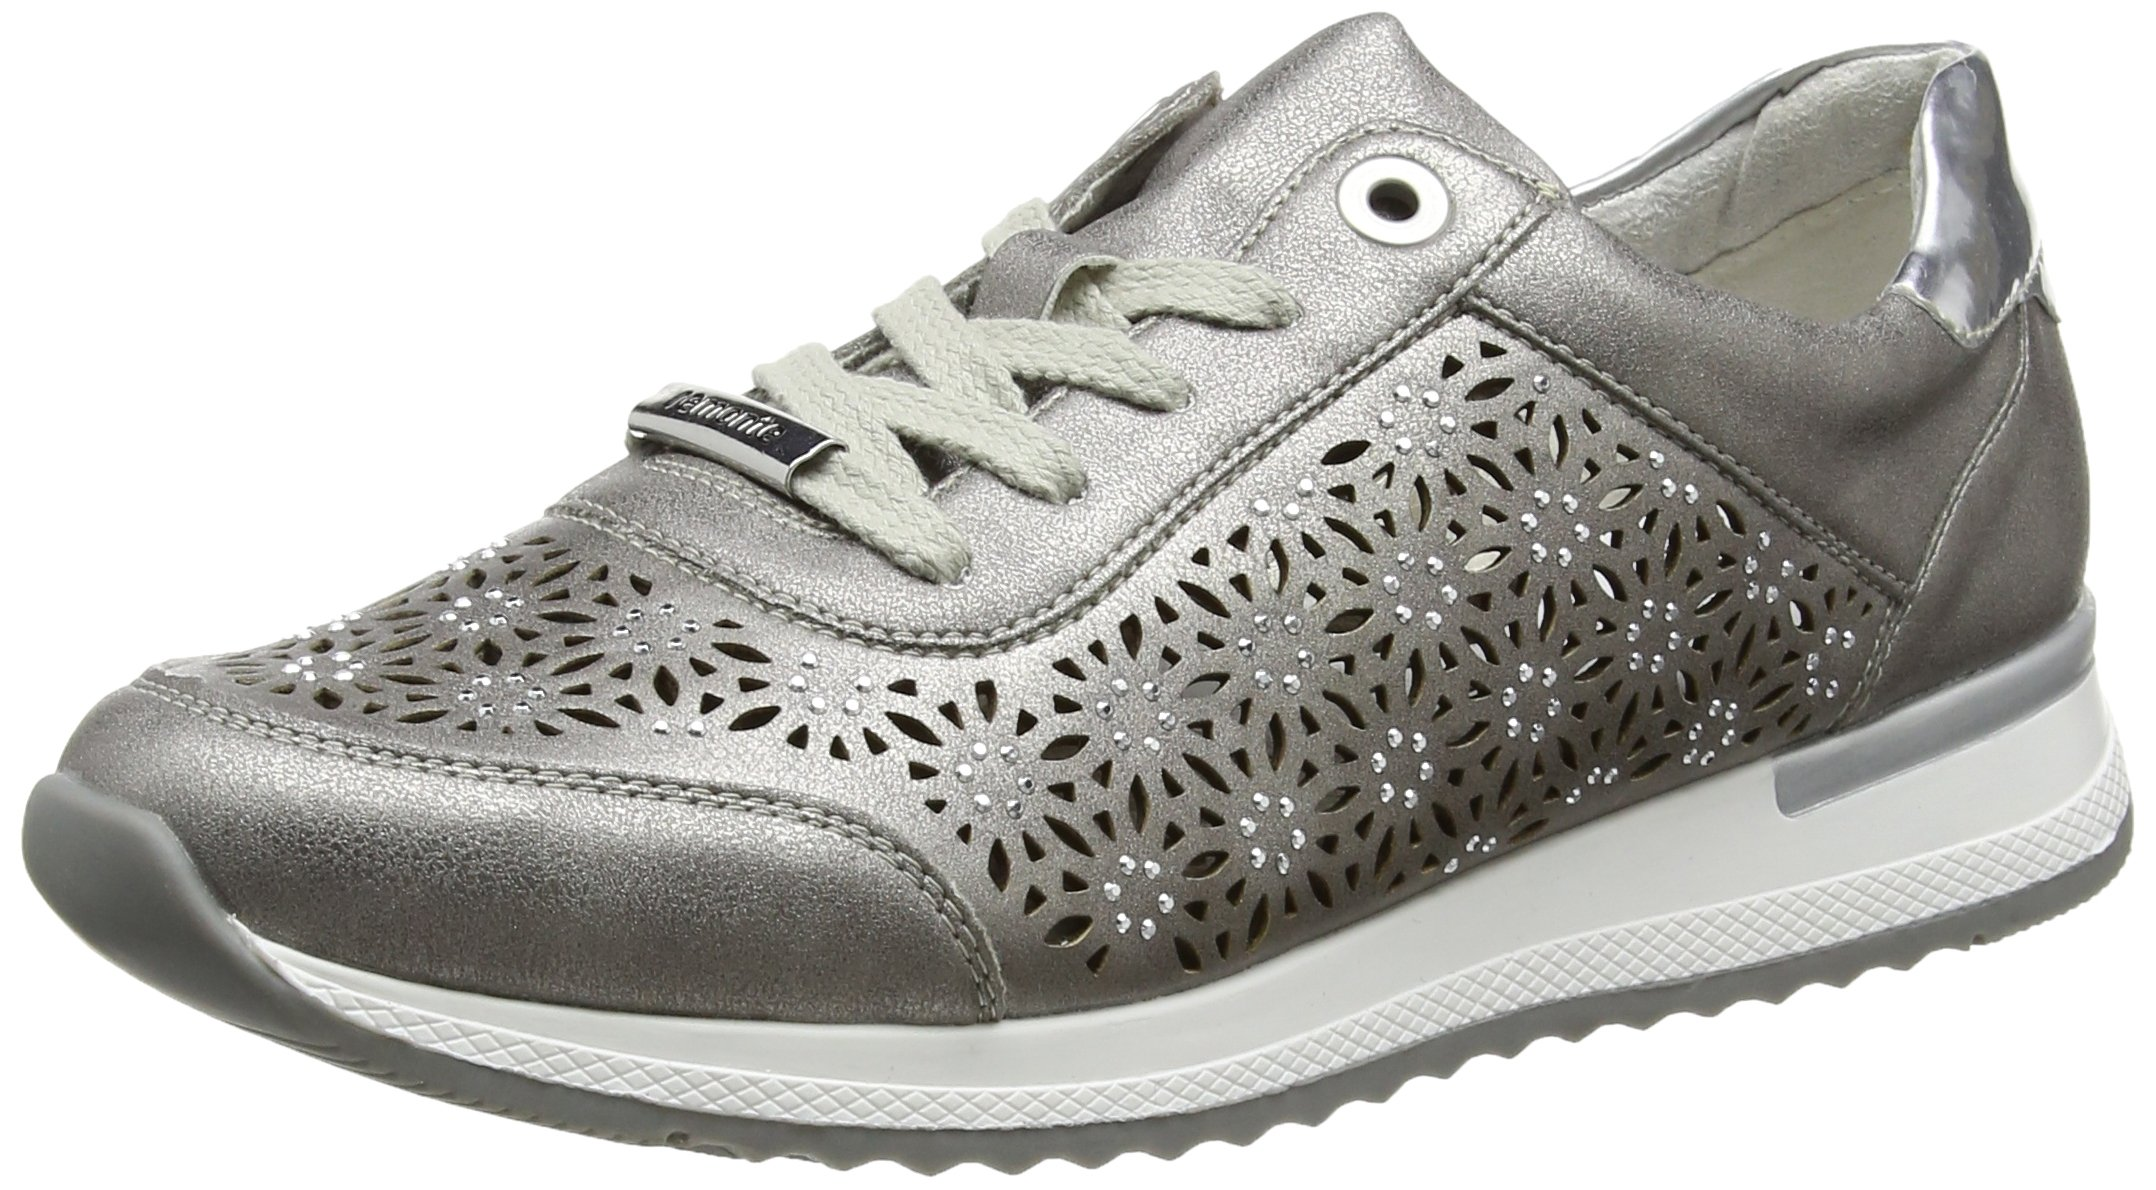 argento9045 R7004Sneakers Basses Eu FemmeGrisaltsilber Remonte 1cFKuJ3Tl